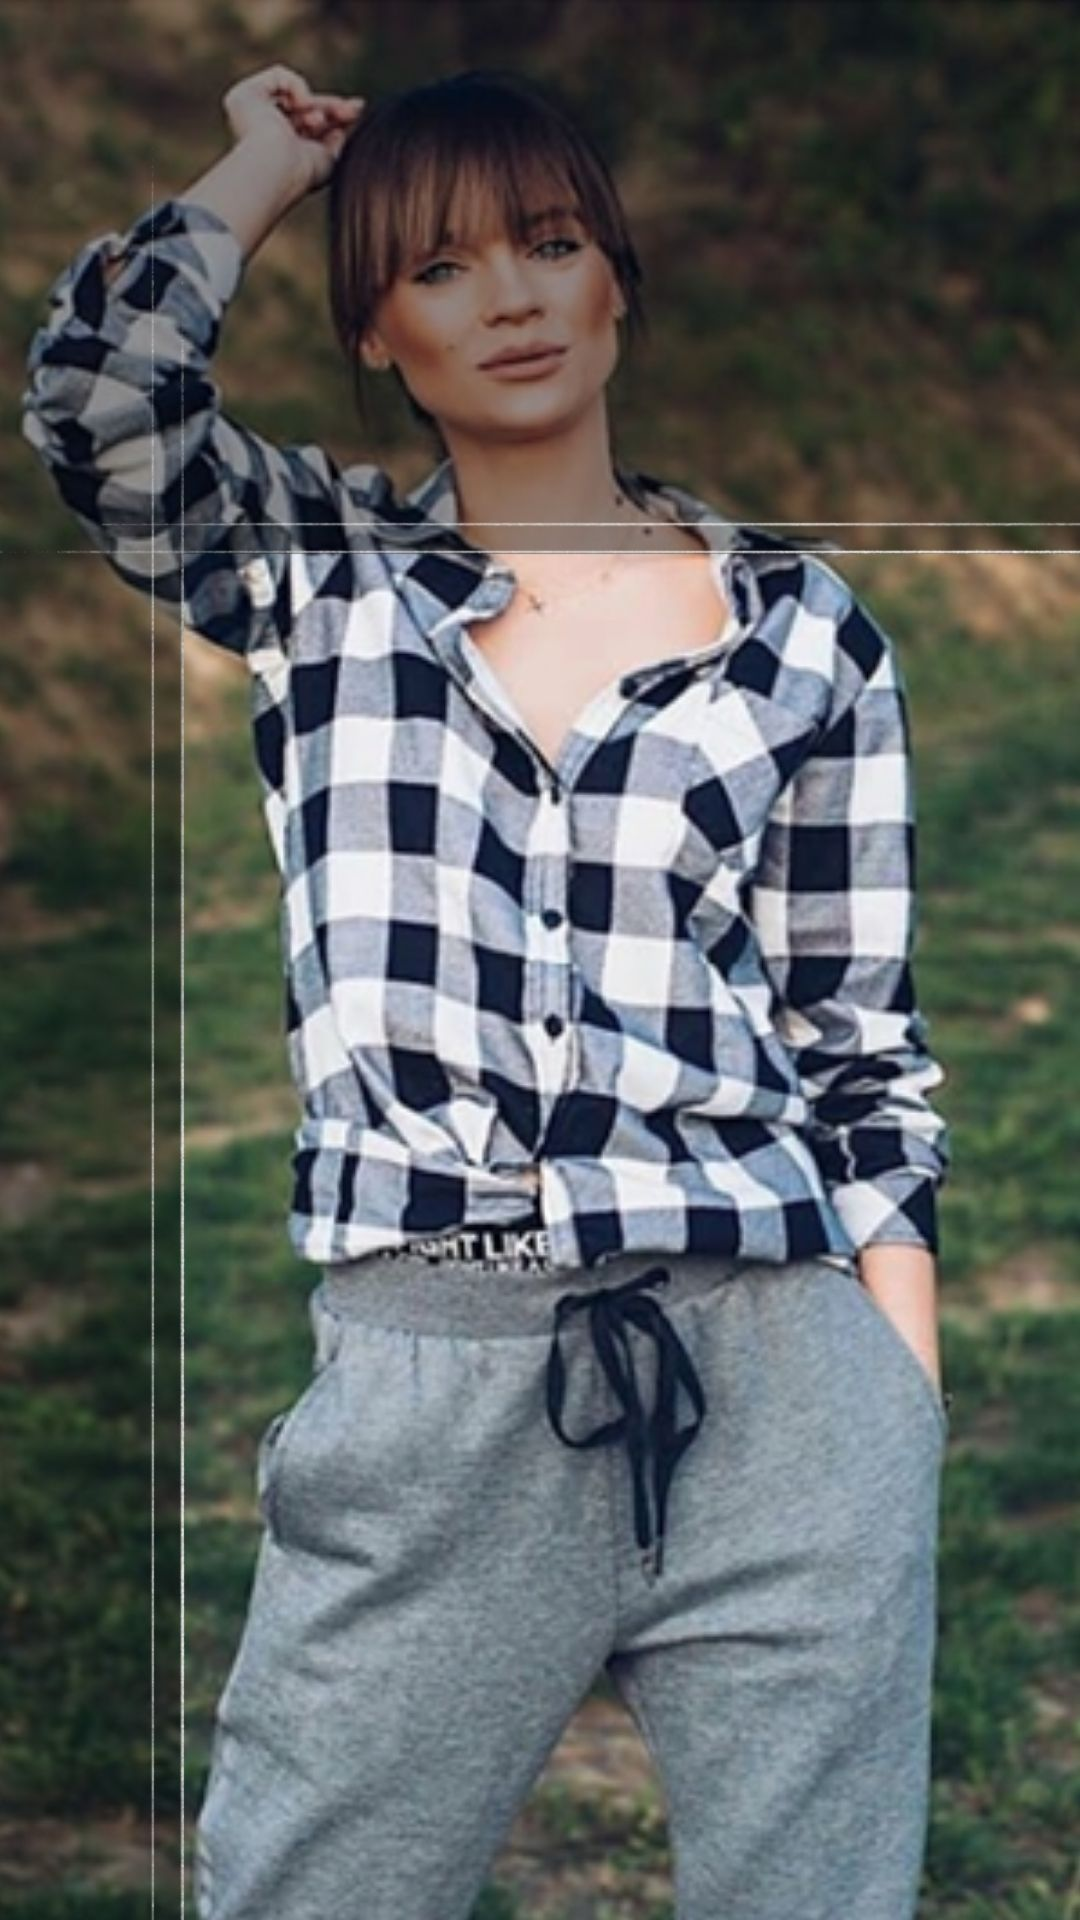 Koszula W Krate Flanela S Biala Polski Producent 8480296094 Oficjalne Archiwum Allegro Women S Plaid Shirt Plaid Shirt Casual Button Down Shirt